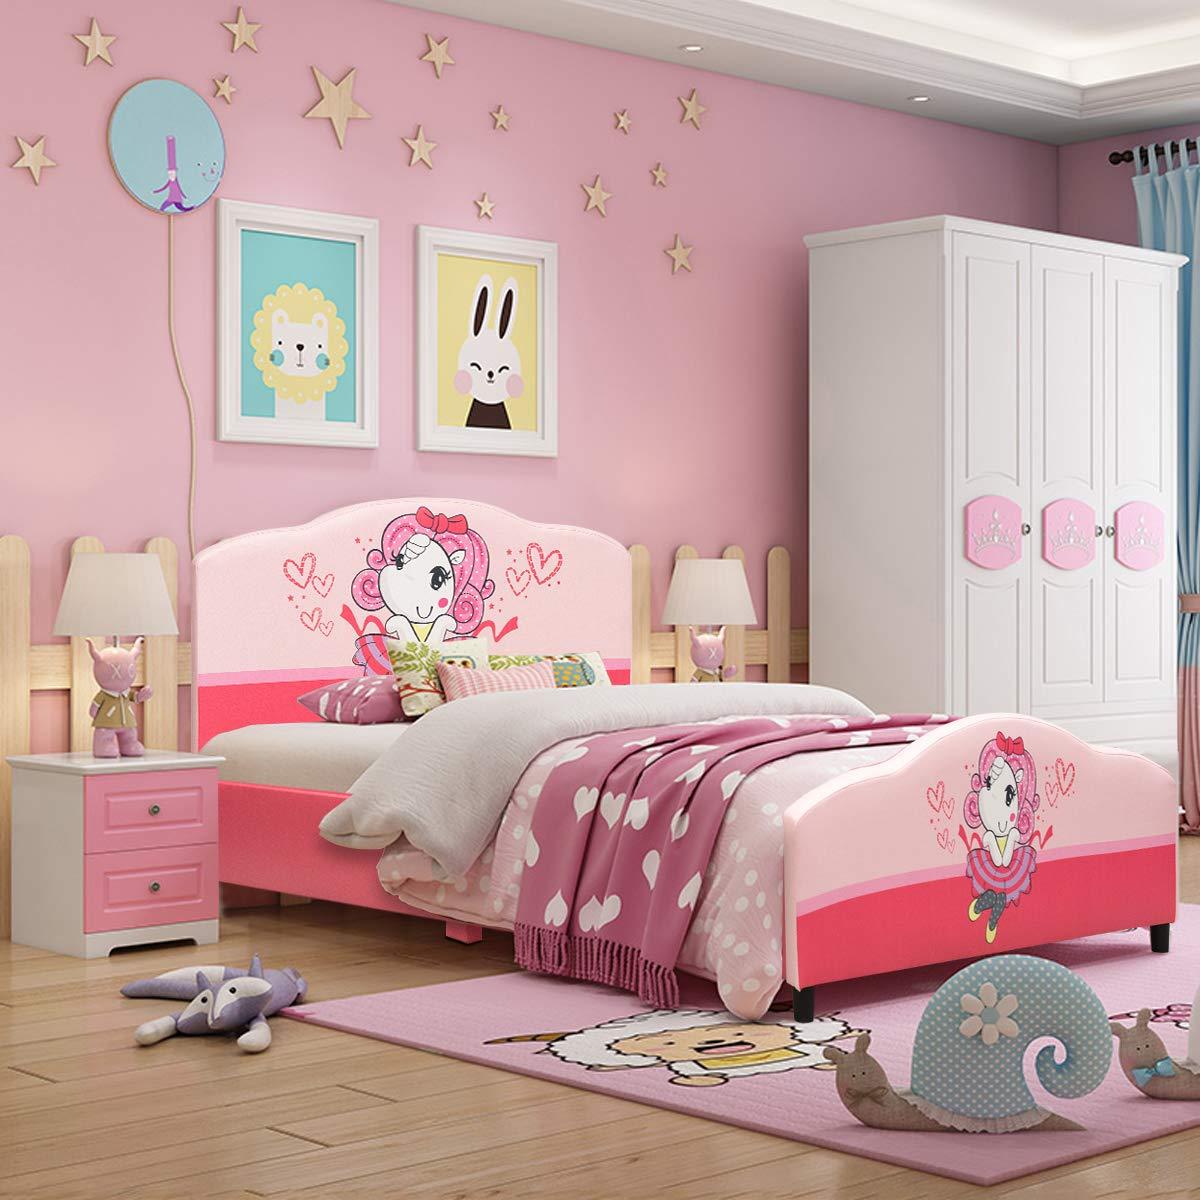 Costzon Toddler Bed, Twin Size Upholstered Platform Bed, Kids Bed w/Wood Frame PVC Surface Adjustable Feet for Boys & Girls, Children Classic Sleeping Bedroom Furniture (Princess Pattern, Pink)